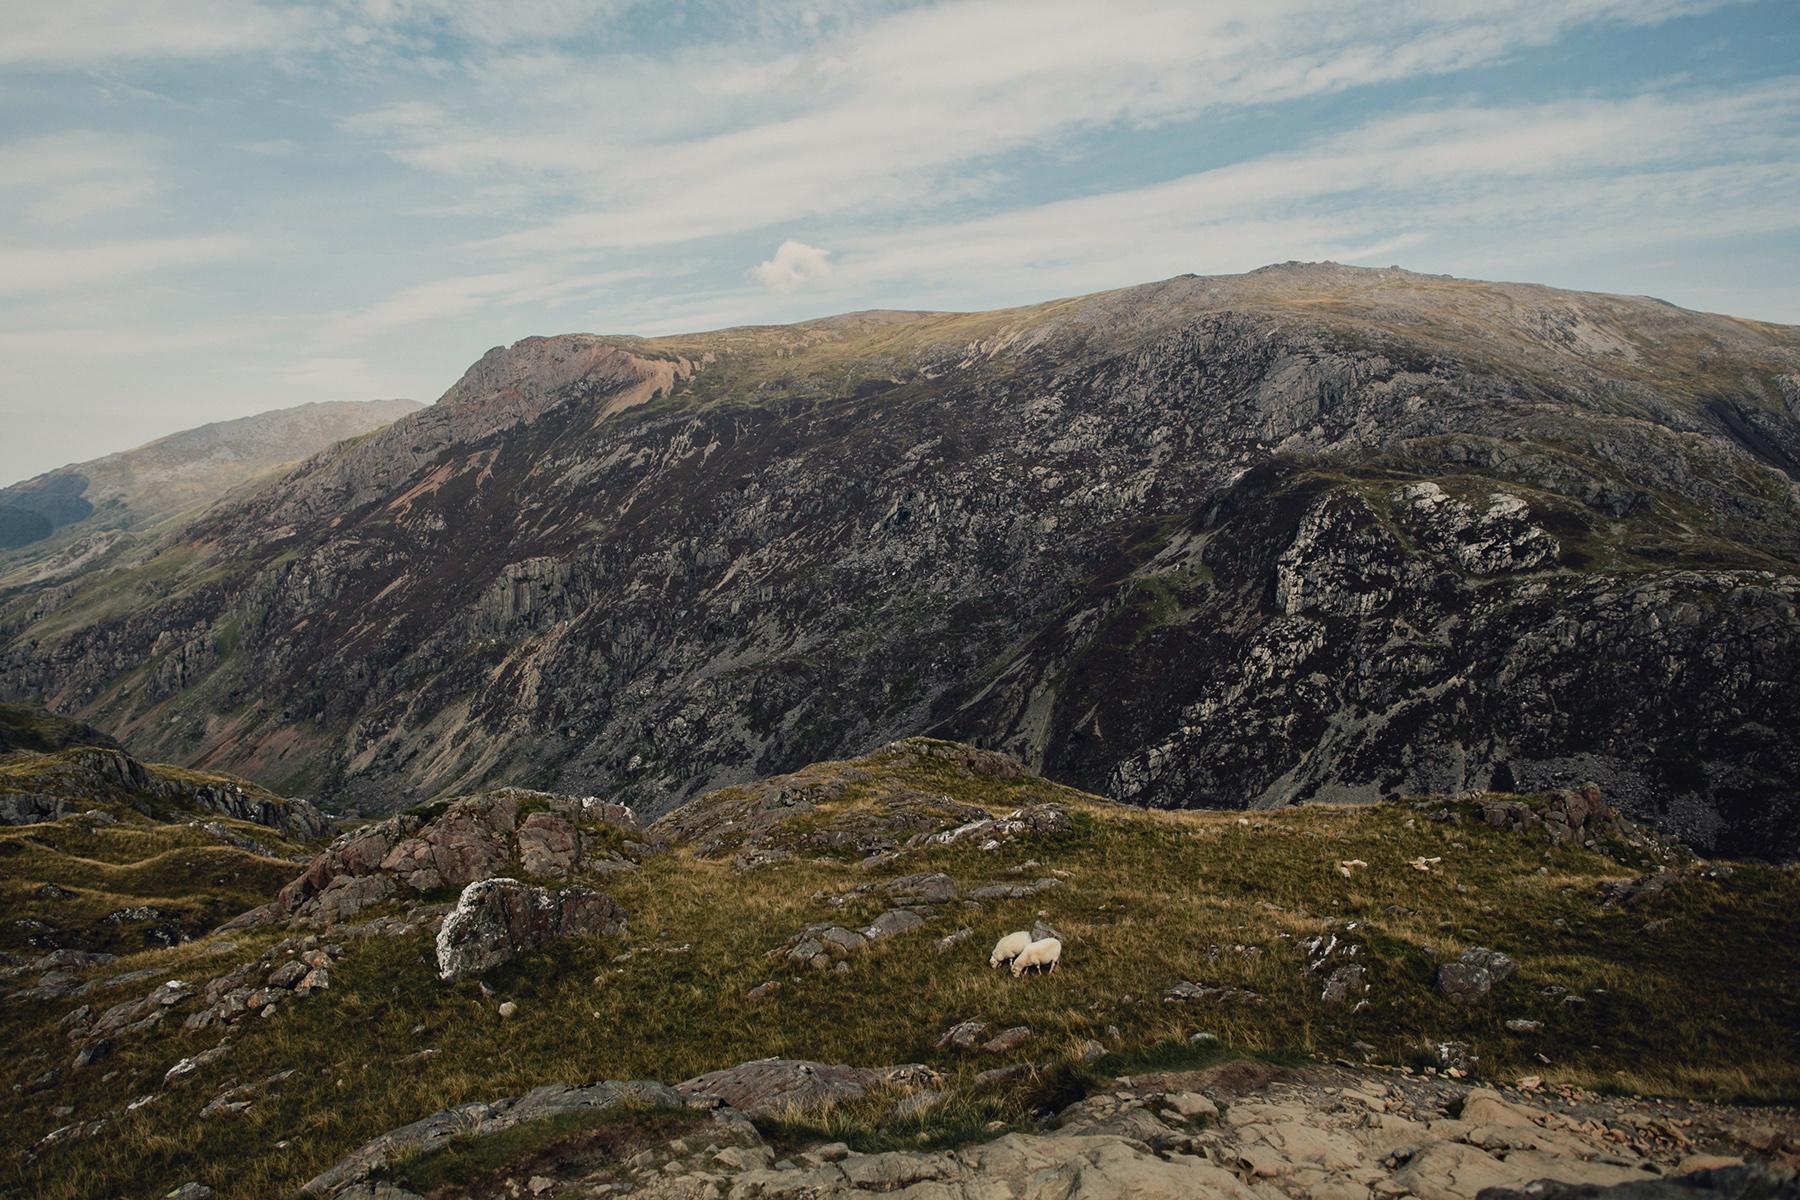 Mt-Snowdon-Hike-Photos-From-Peny-Pass-00121.jpg